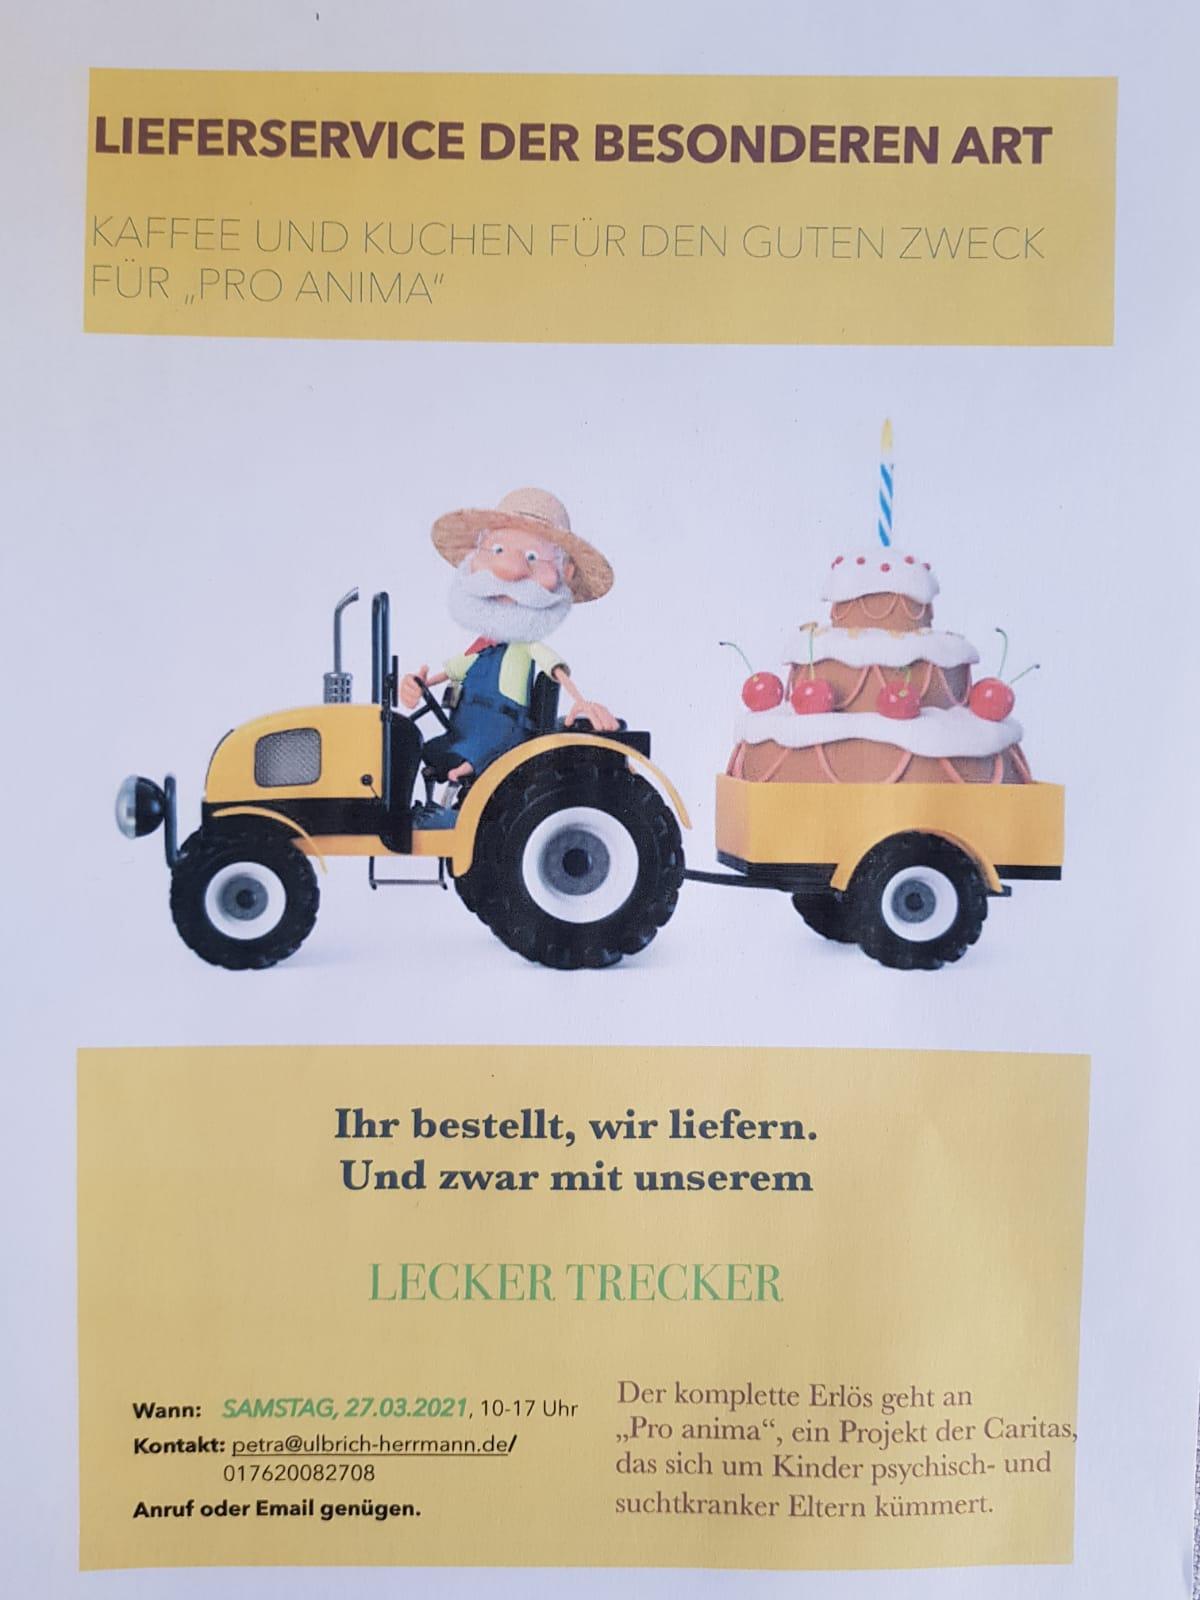 Lecker-Trecker